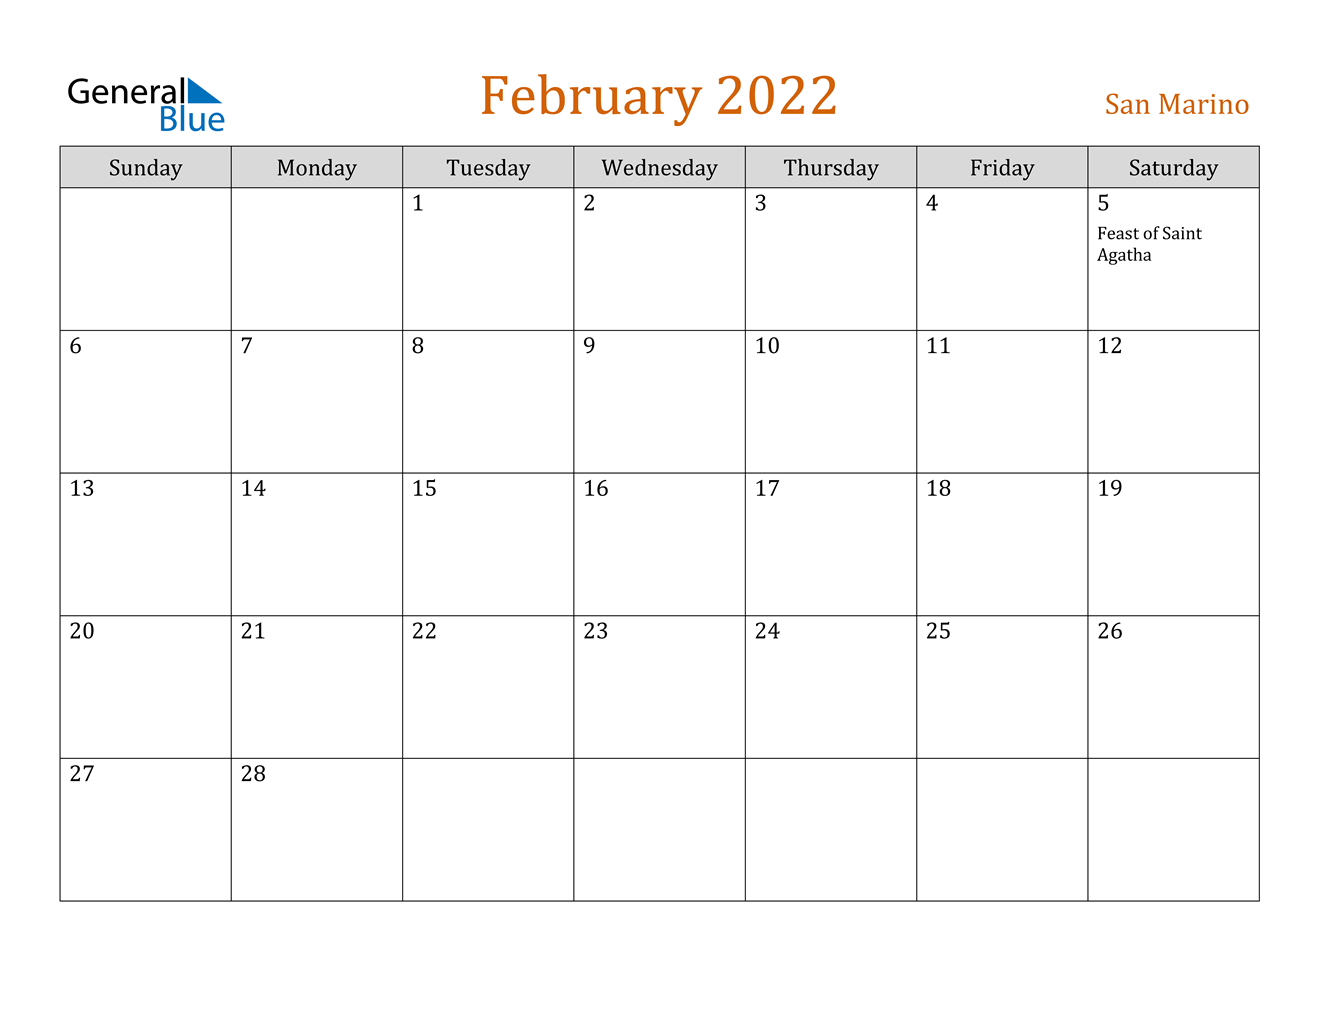 February 2022 Calendar - San Marino